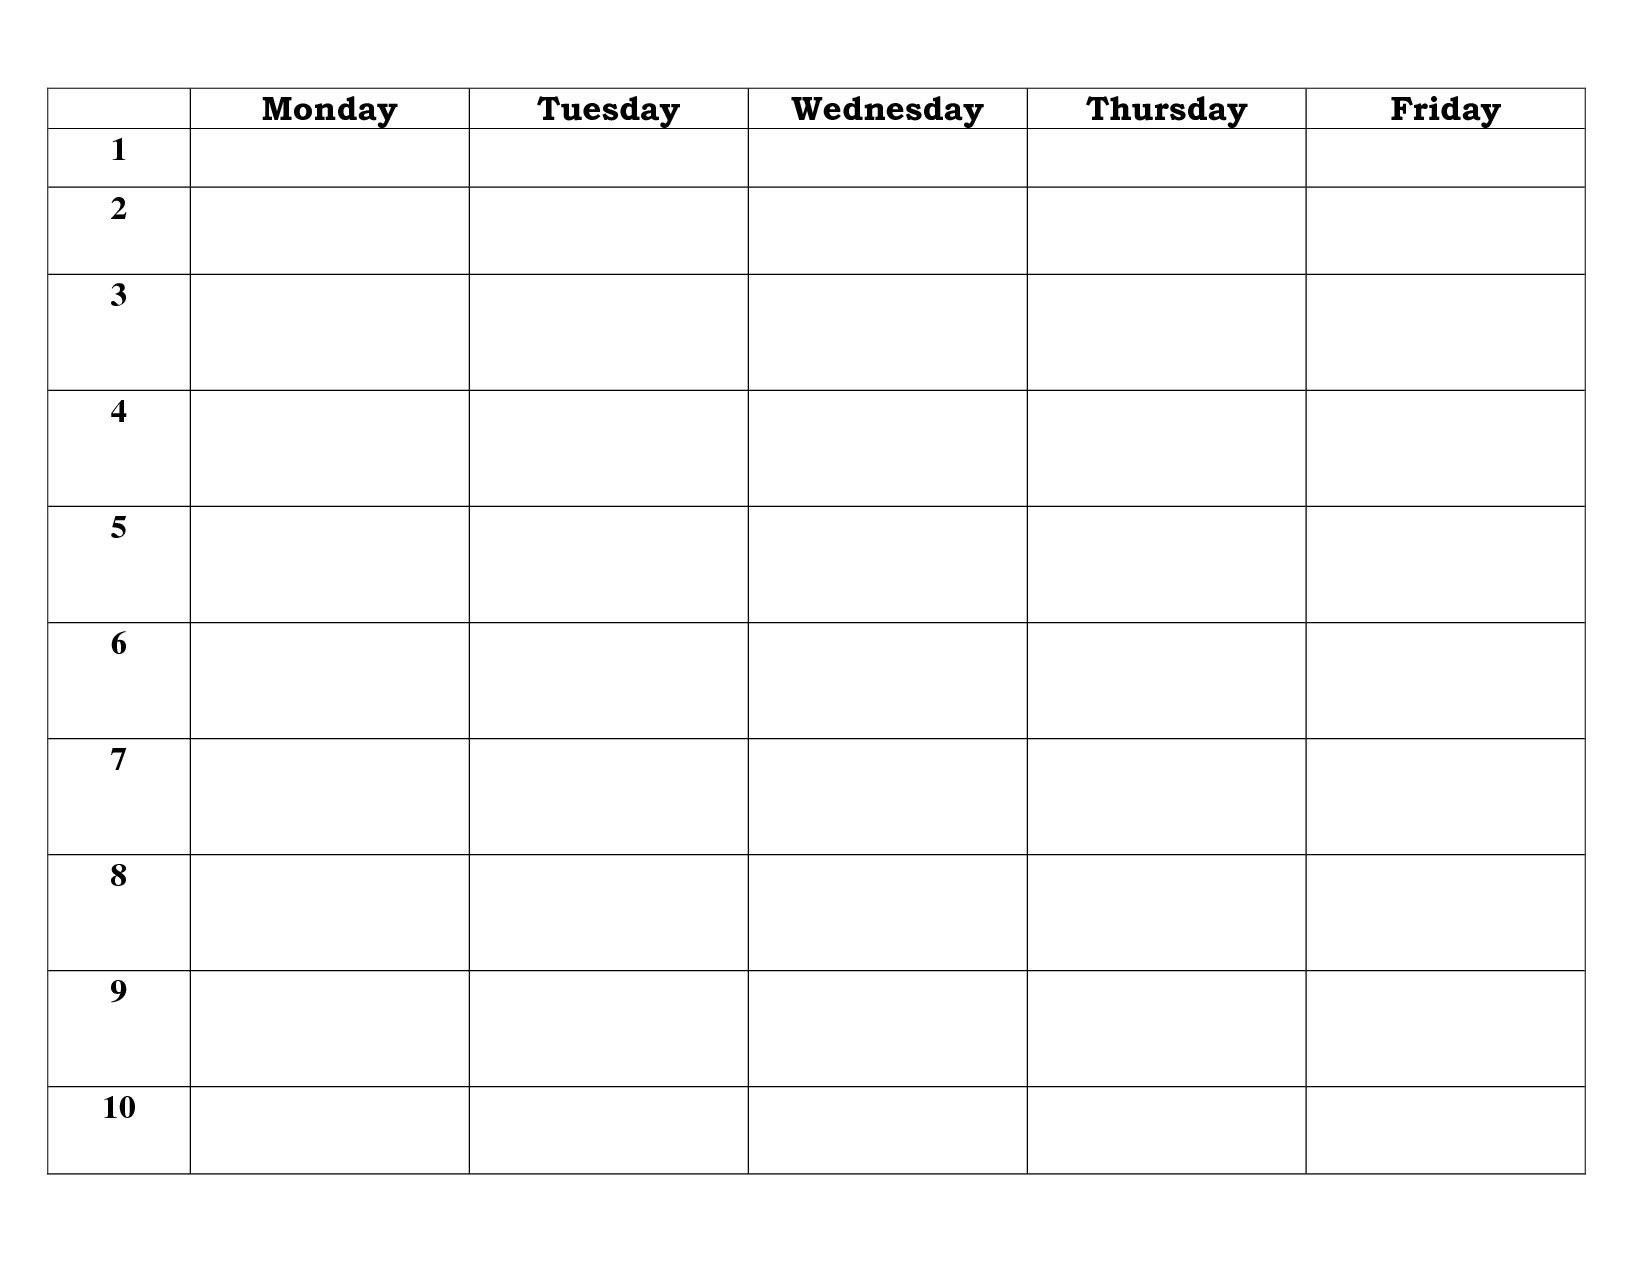 Make Your Own Calendar Free Blank Calendar Template 5 Day Week regarding 5 Day Week Calendar Template